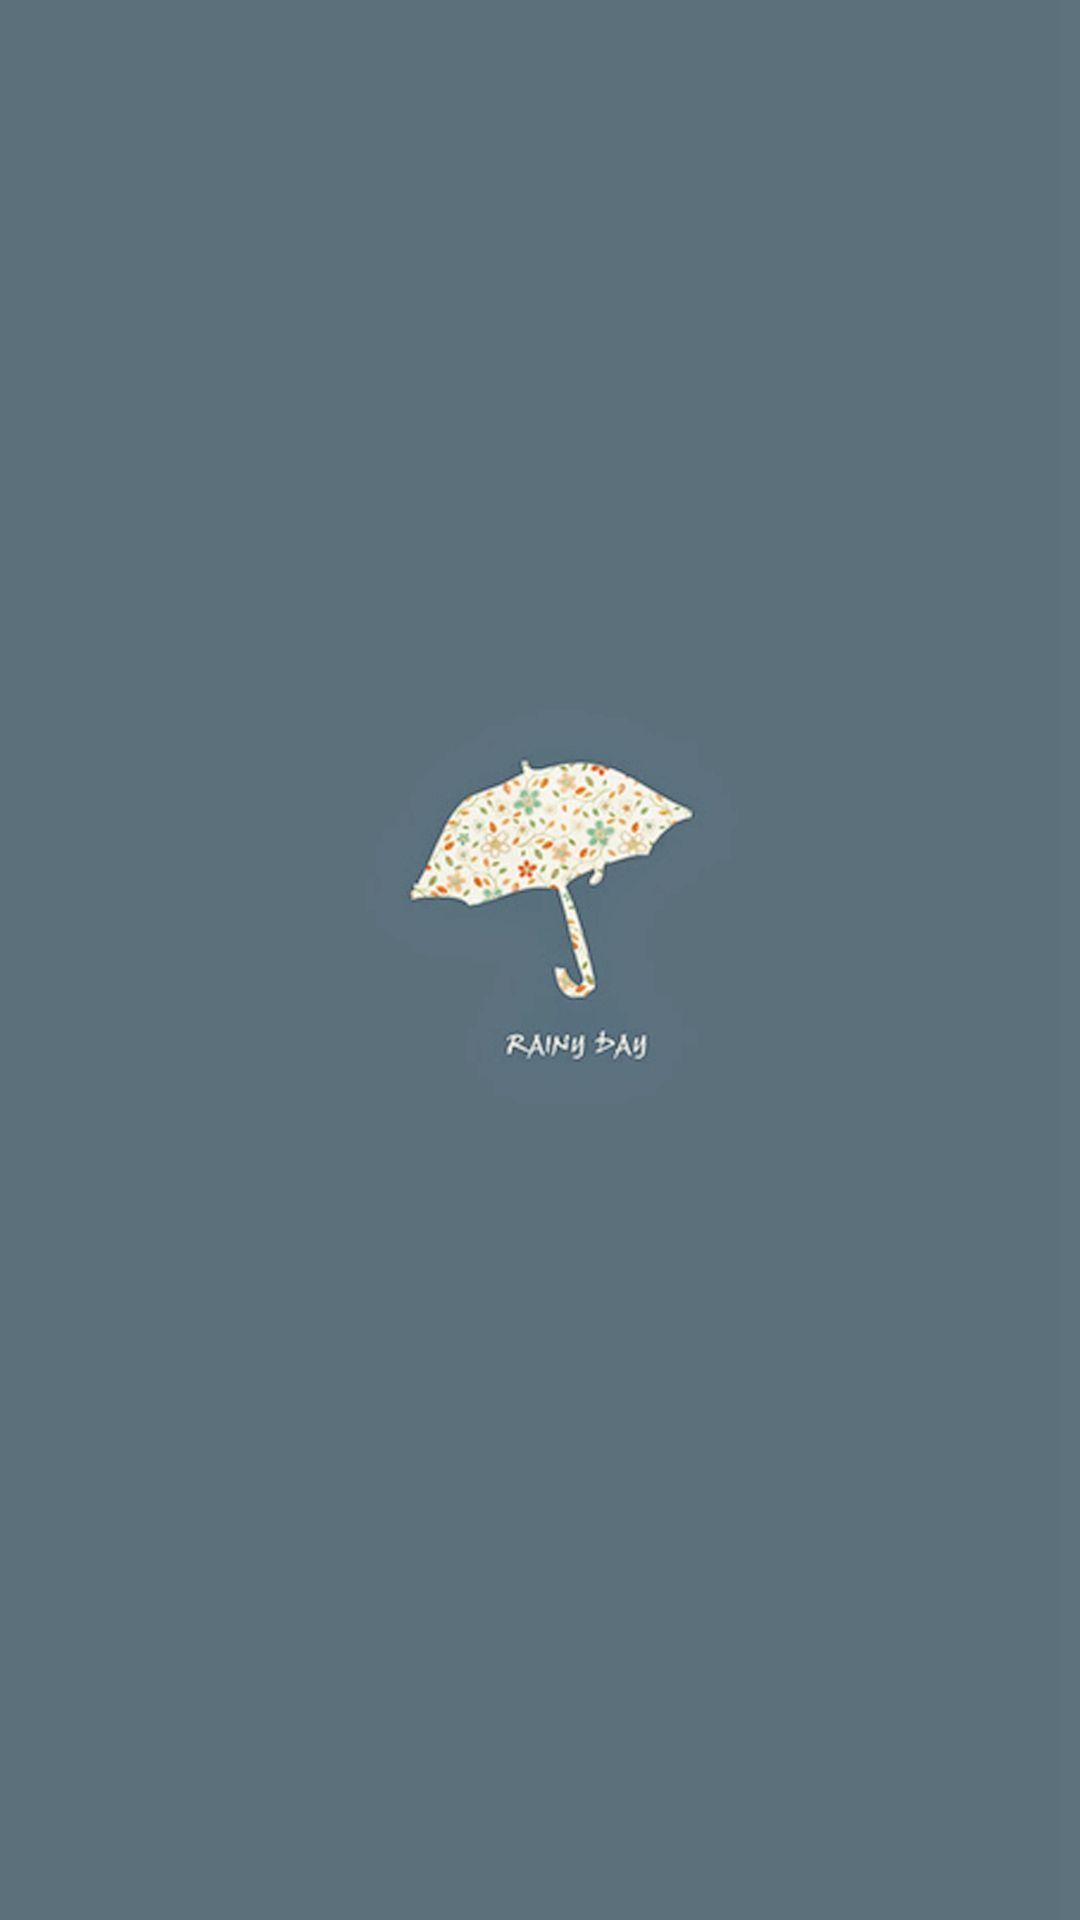 Rainy Day Simple Minimal iPhone 6 plus wallpaper